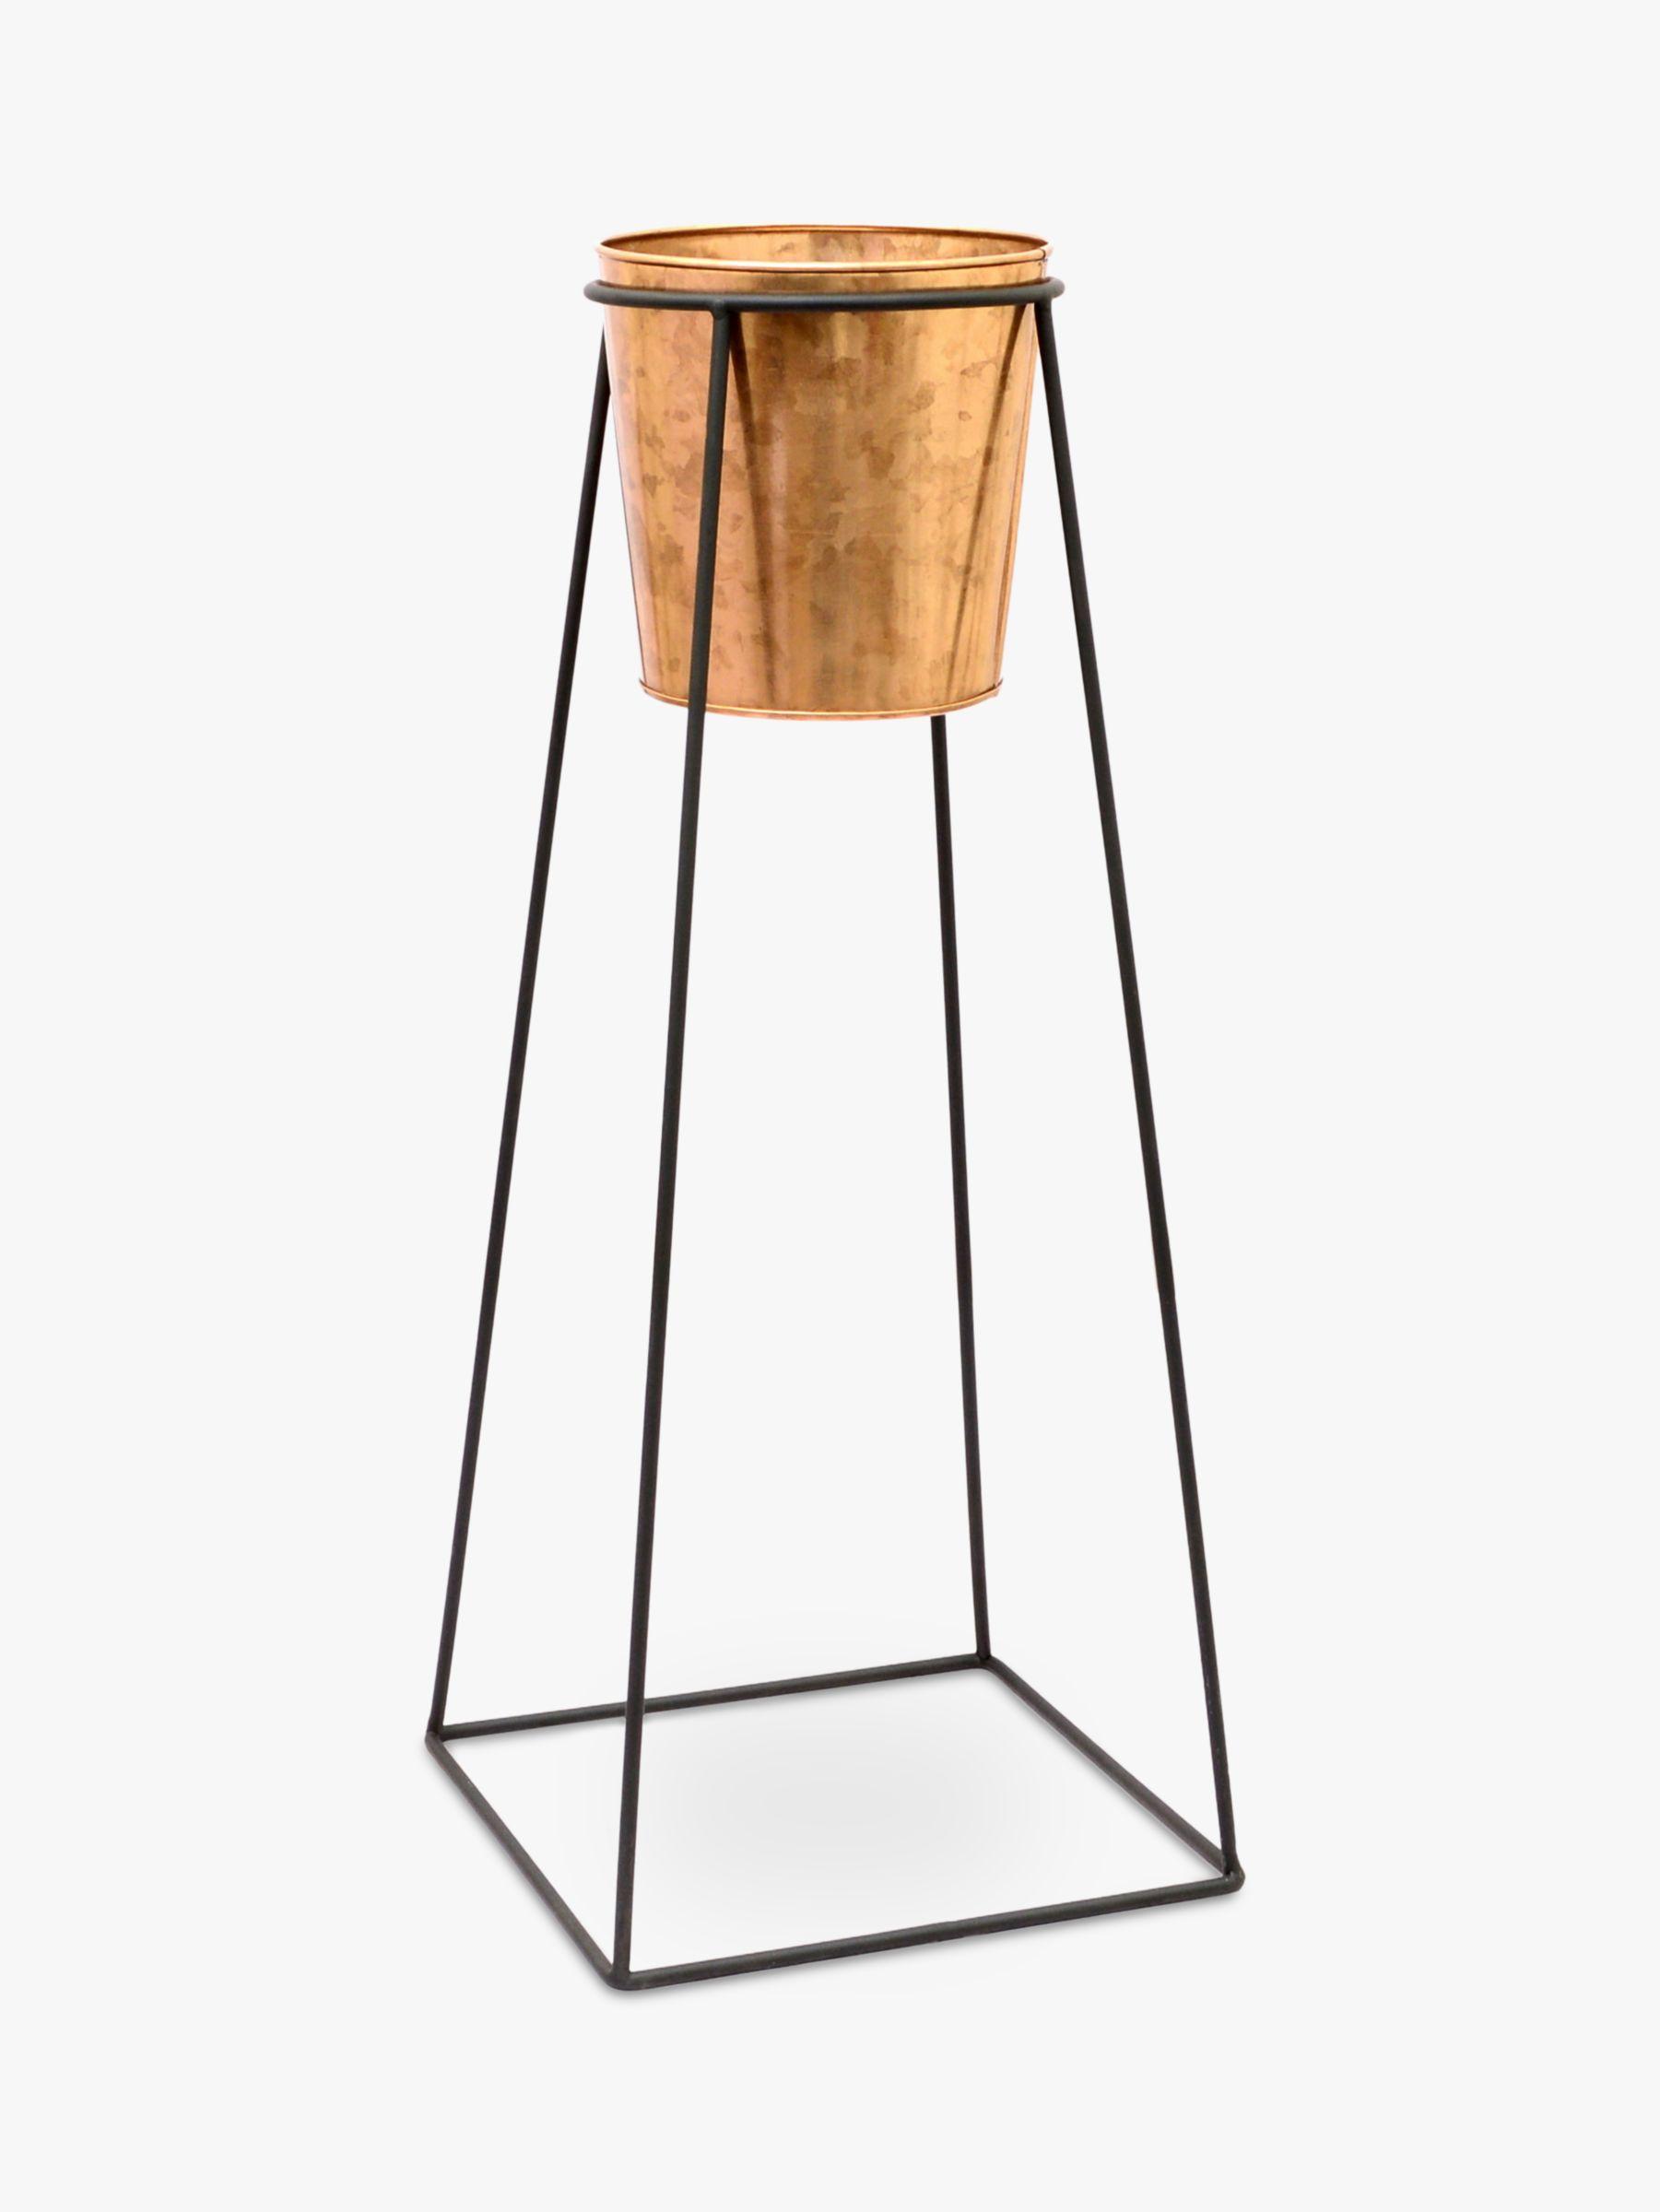 Ivyline Ivyline Indoor Plant Pot and Mimmo Stand, H60.5cm